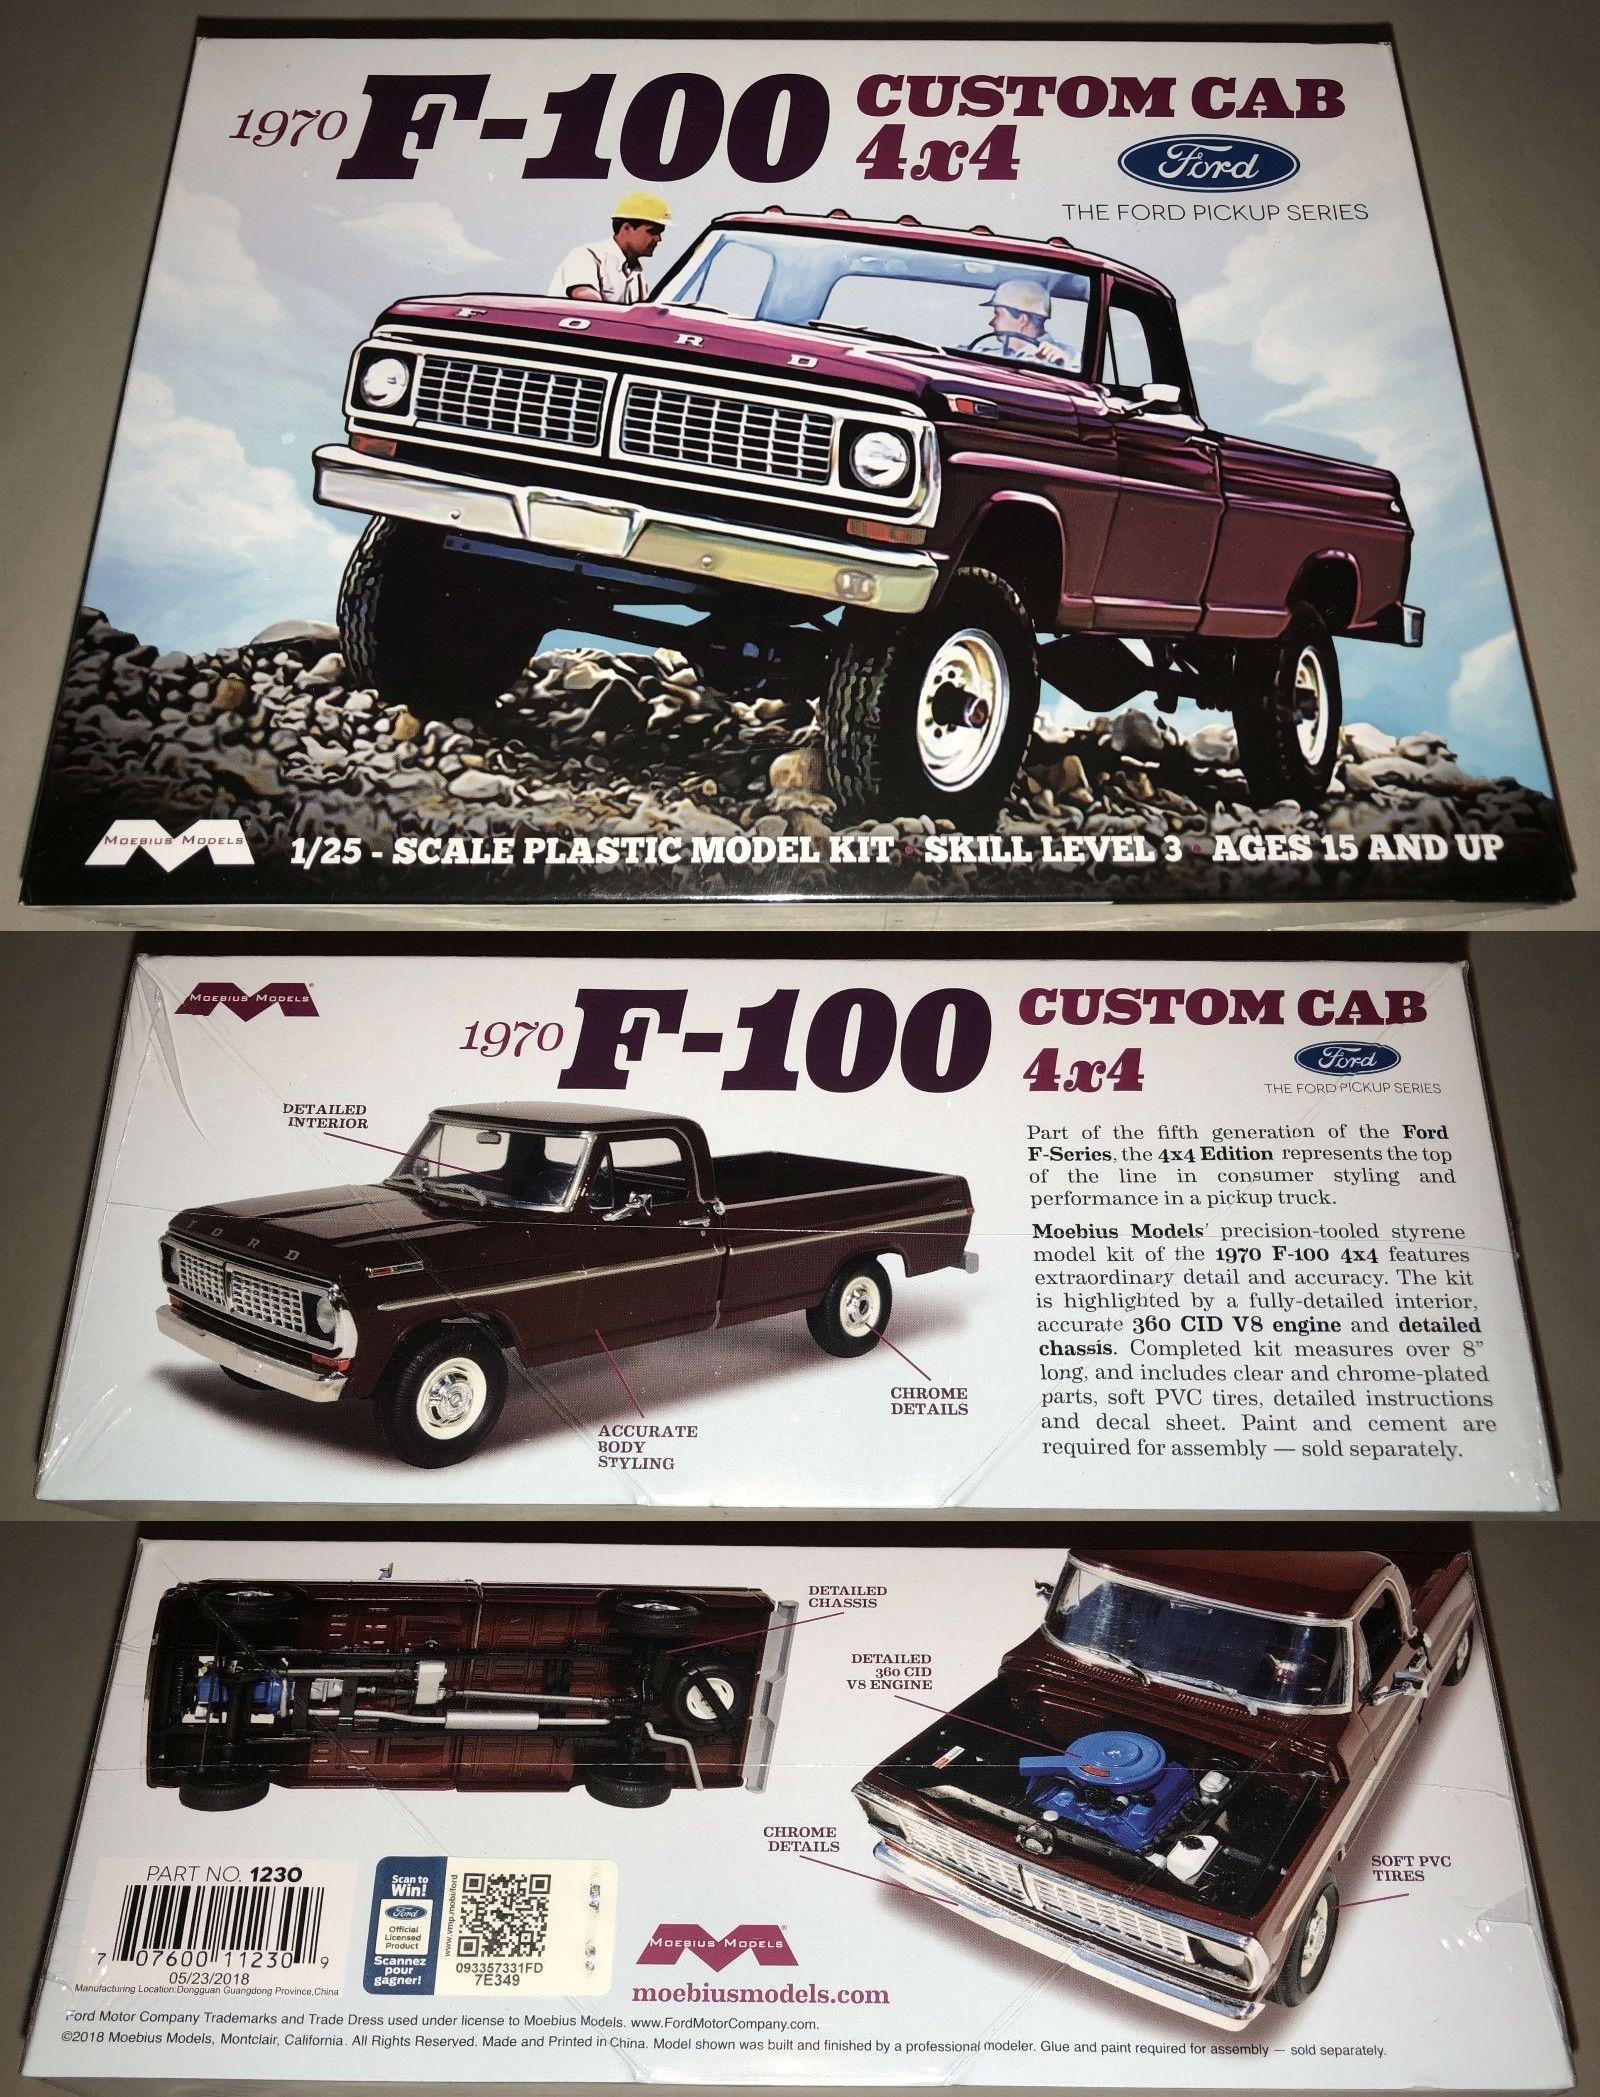 Classic 2581 Moebius 1970 Ford F 100 Custom Cab 4x4 Pickup 1 25 Plastic Model Kit New 1230 Buy It Now Only 25 Plastic Model Kits Model Kit Plastic Models